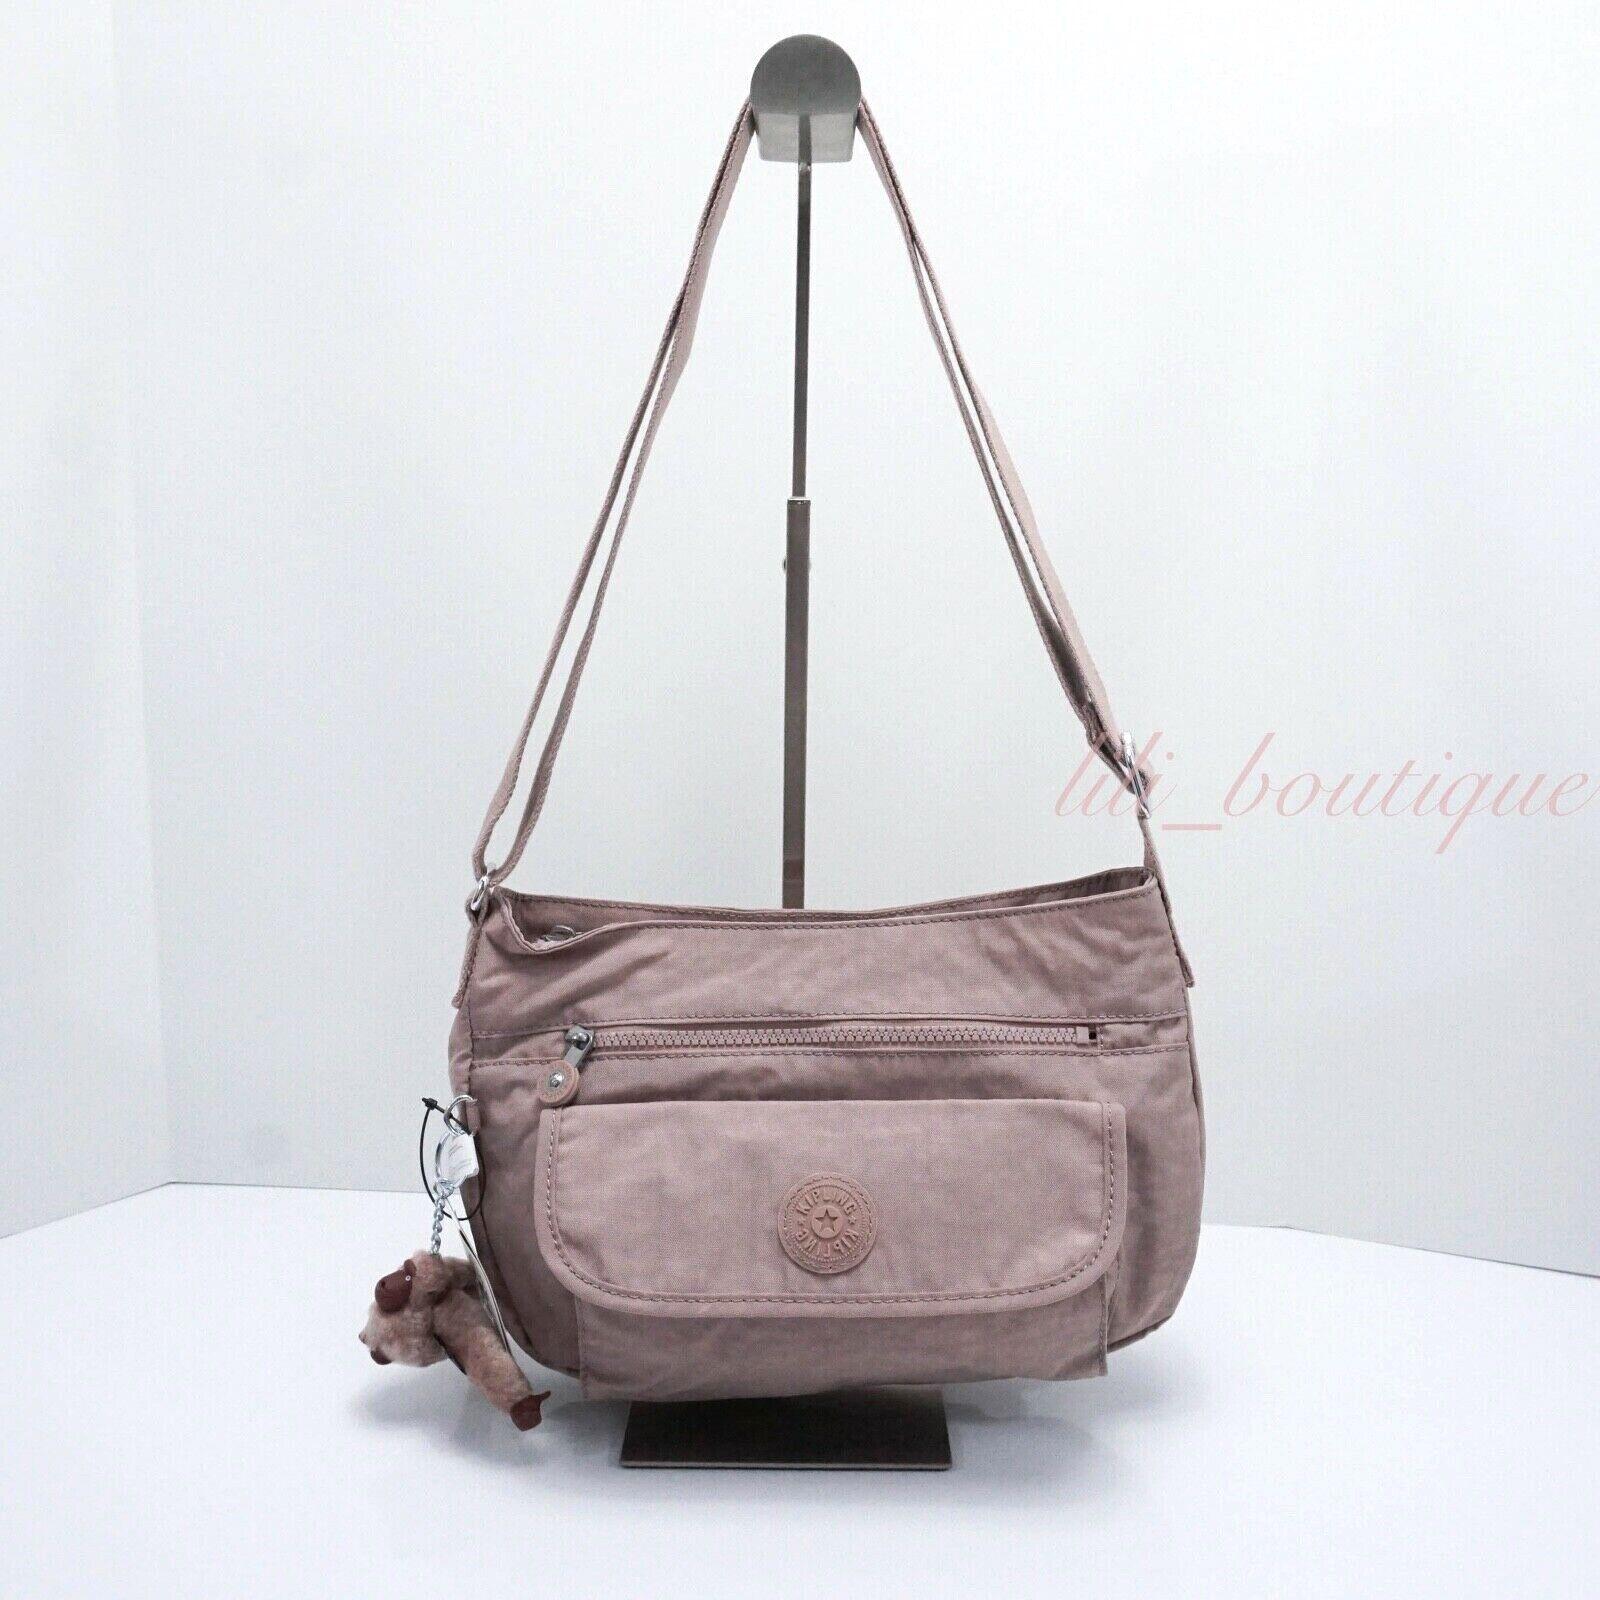 NWT Kipling HB3819 Syro Crossbody Shoulder Bag Purse Nylon A